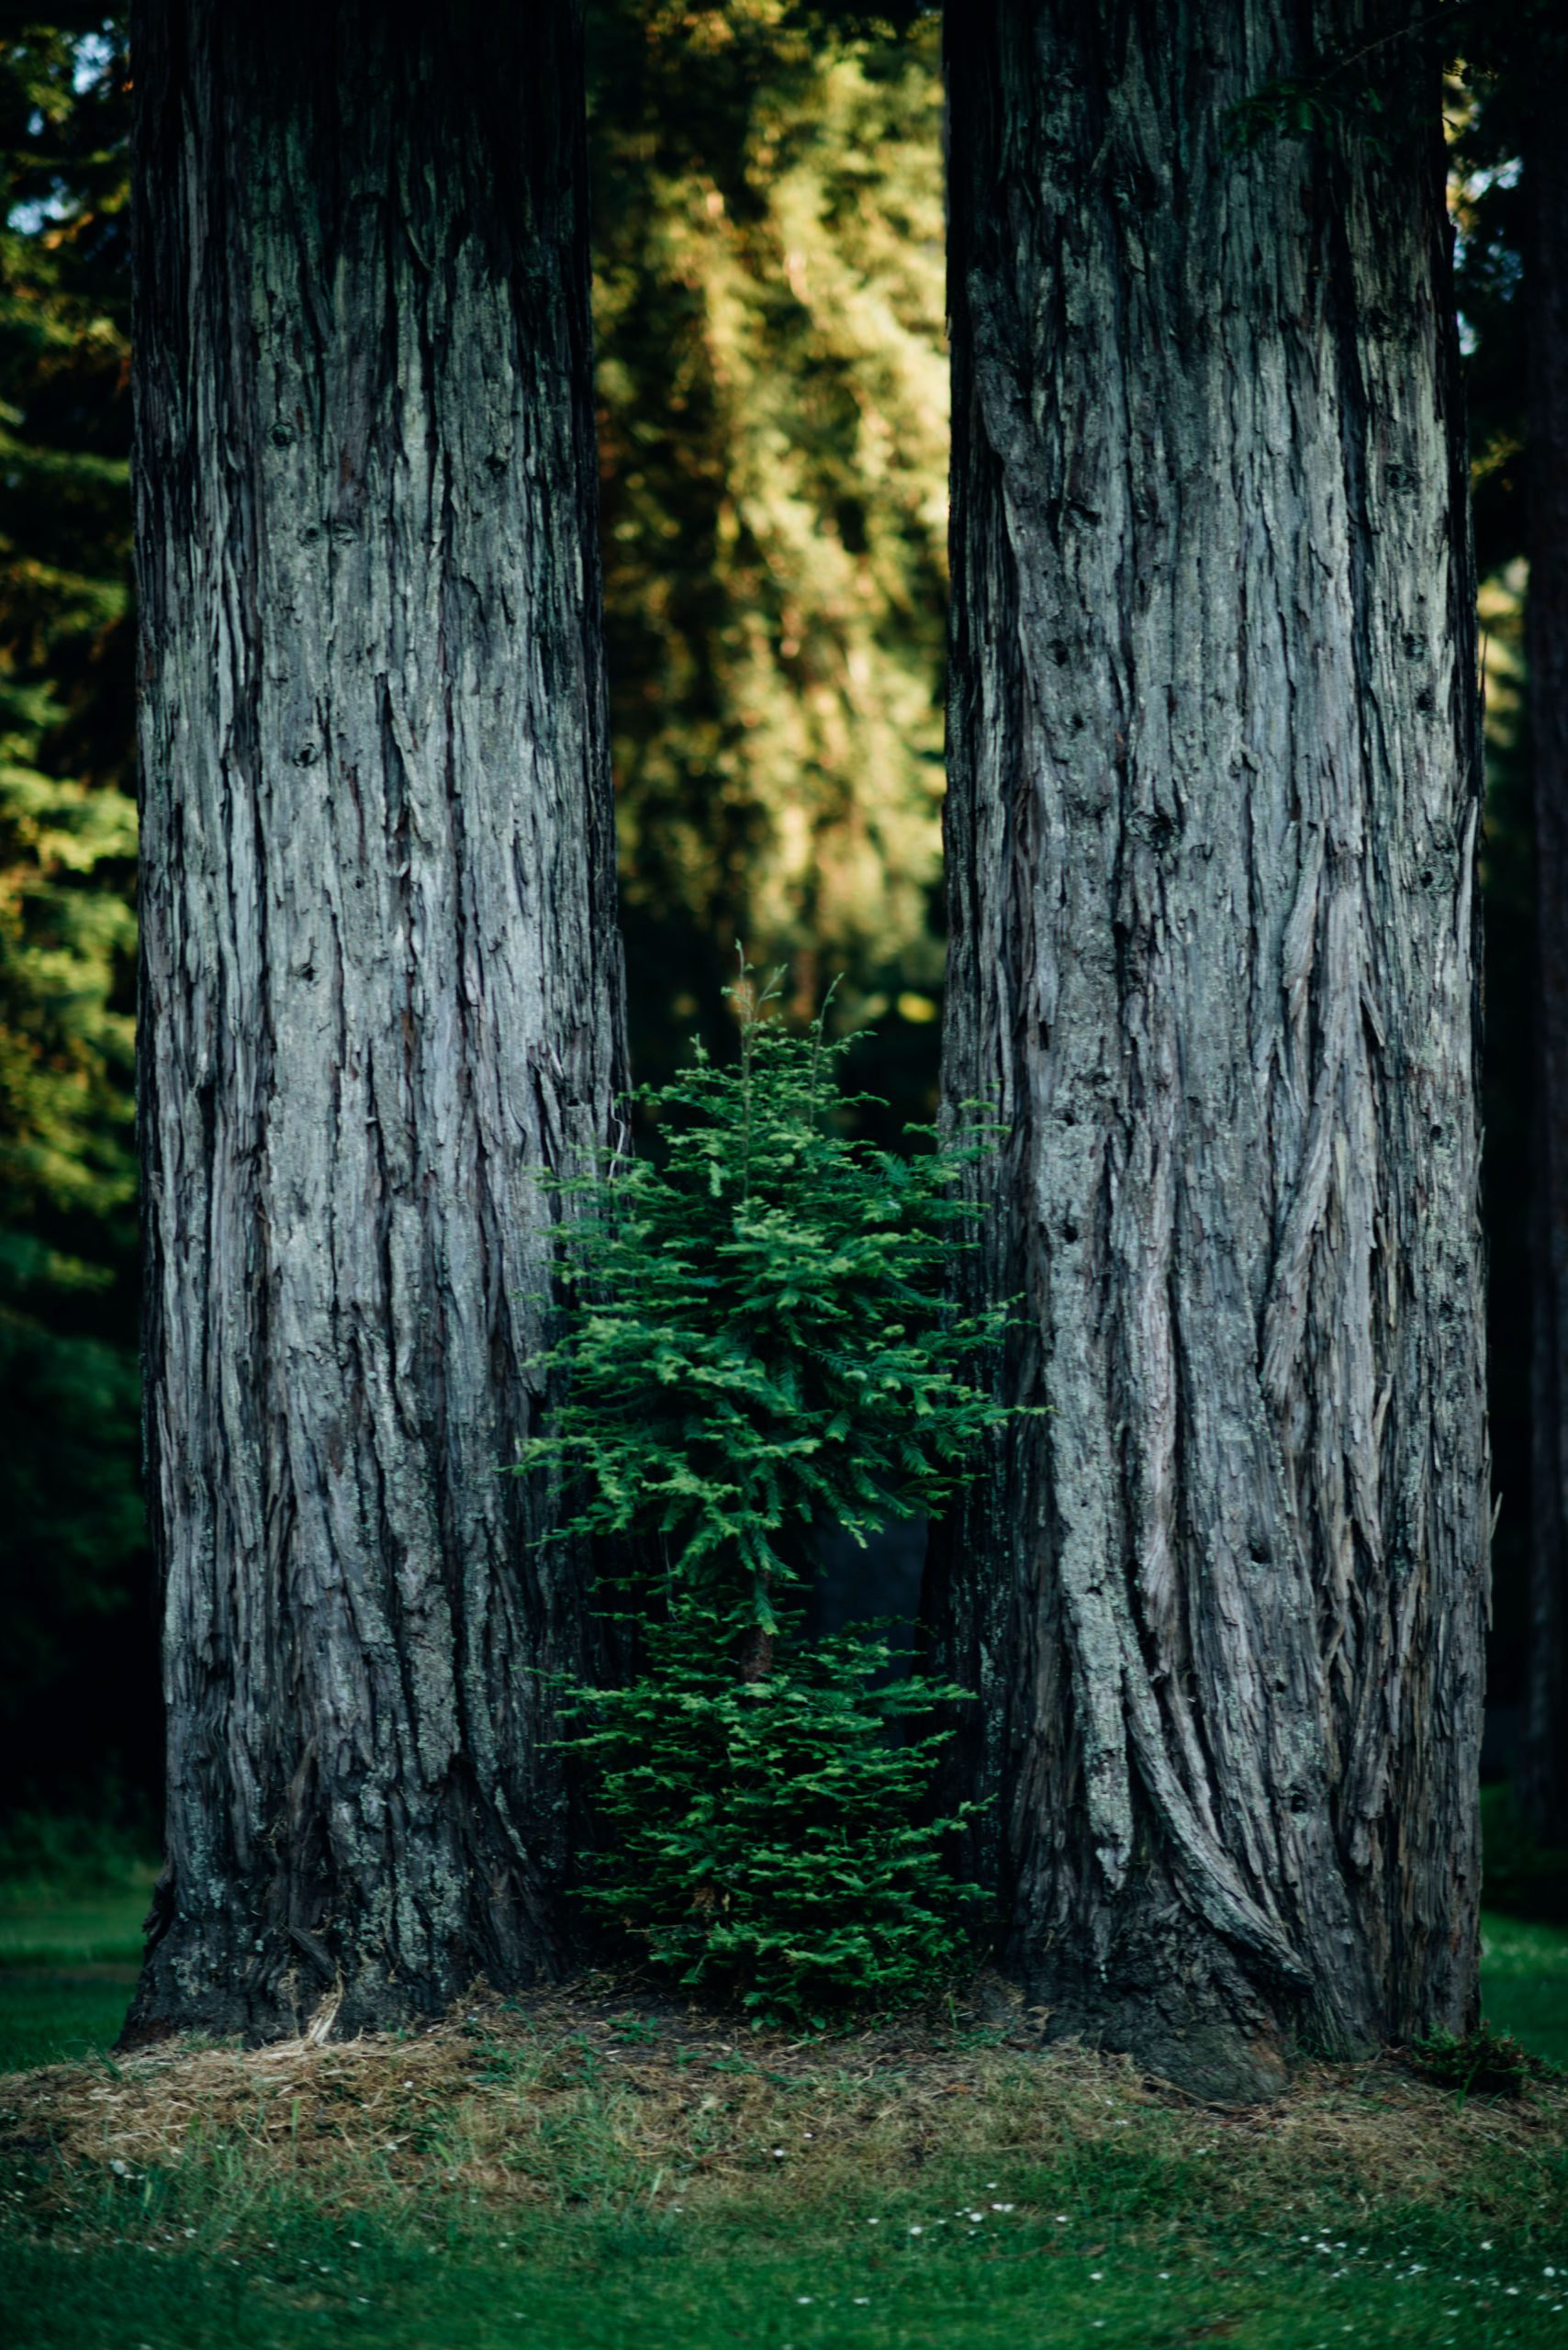 Two Tall Tales. Photo by Kohjiro Kinno